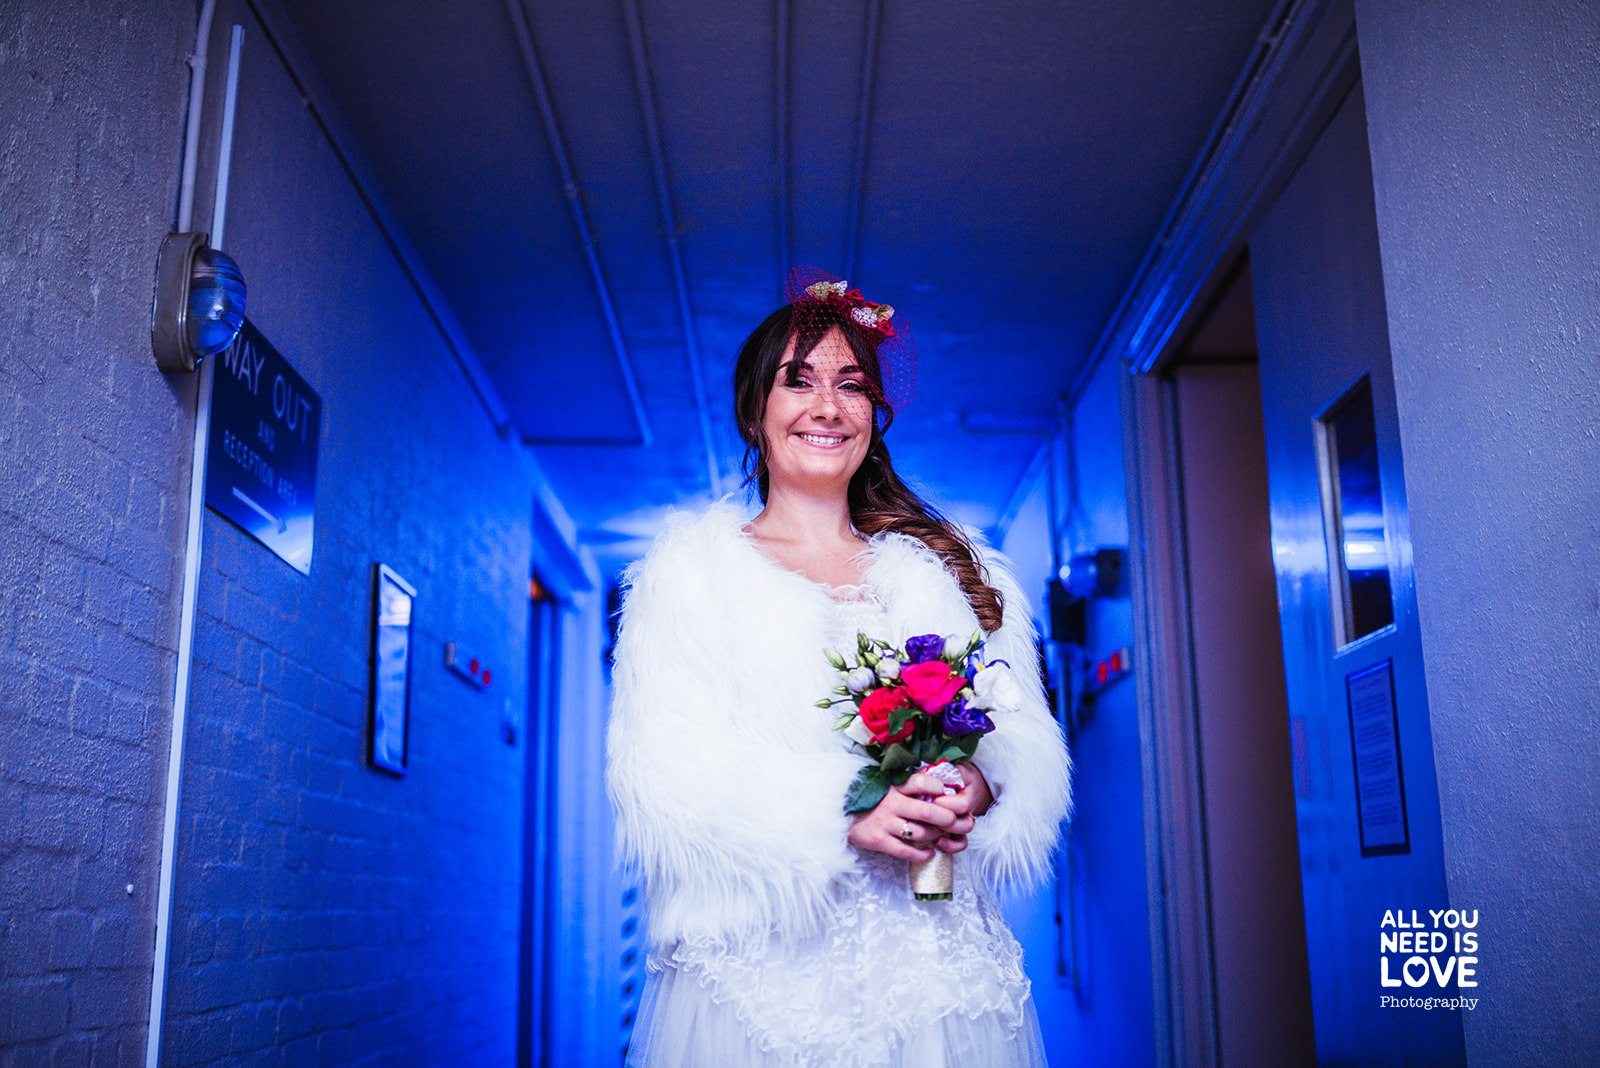 RAF Holmpton- All You Need Is Love Photography- Army Wedding Venue- Historic Wedding Venue- Underground wedding venue- unique wedding venue- the best alternative wedding venues- unconventional wedding- 2